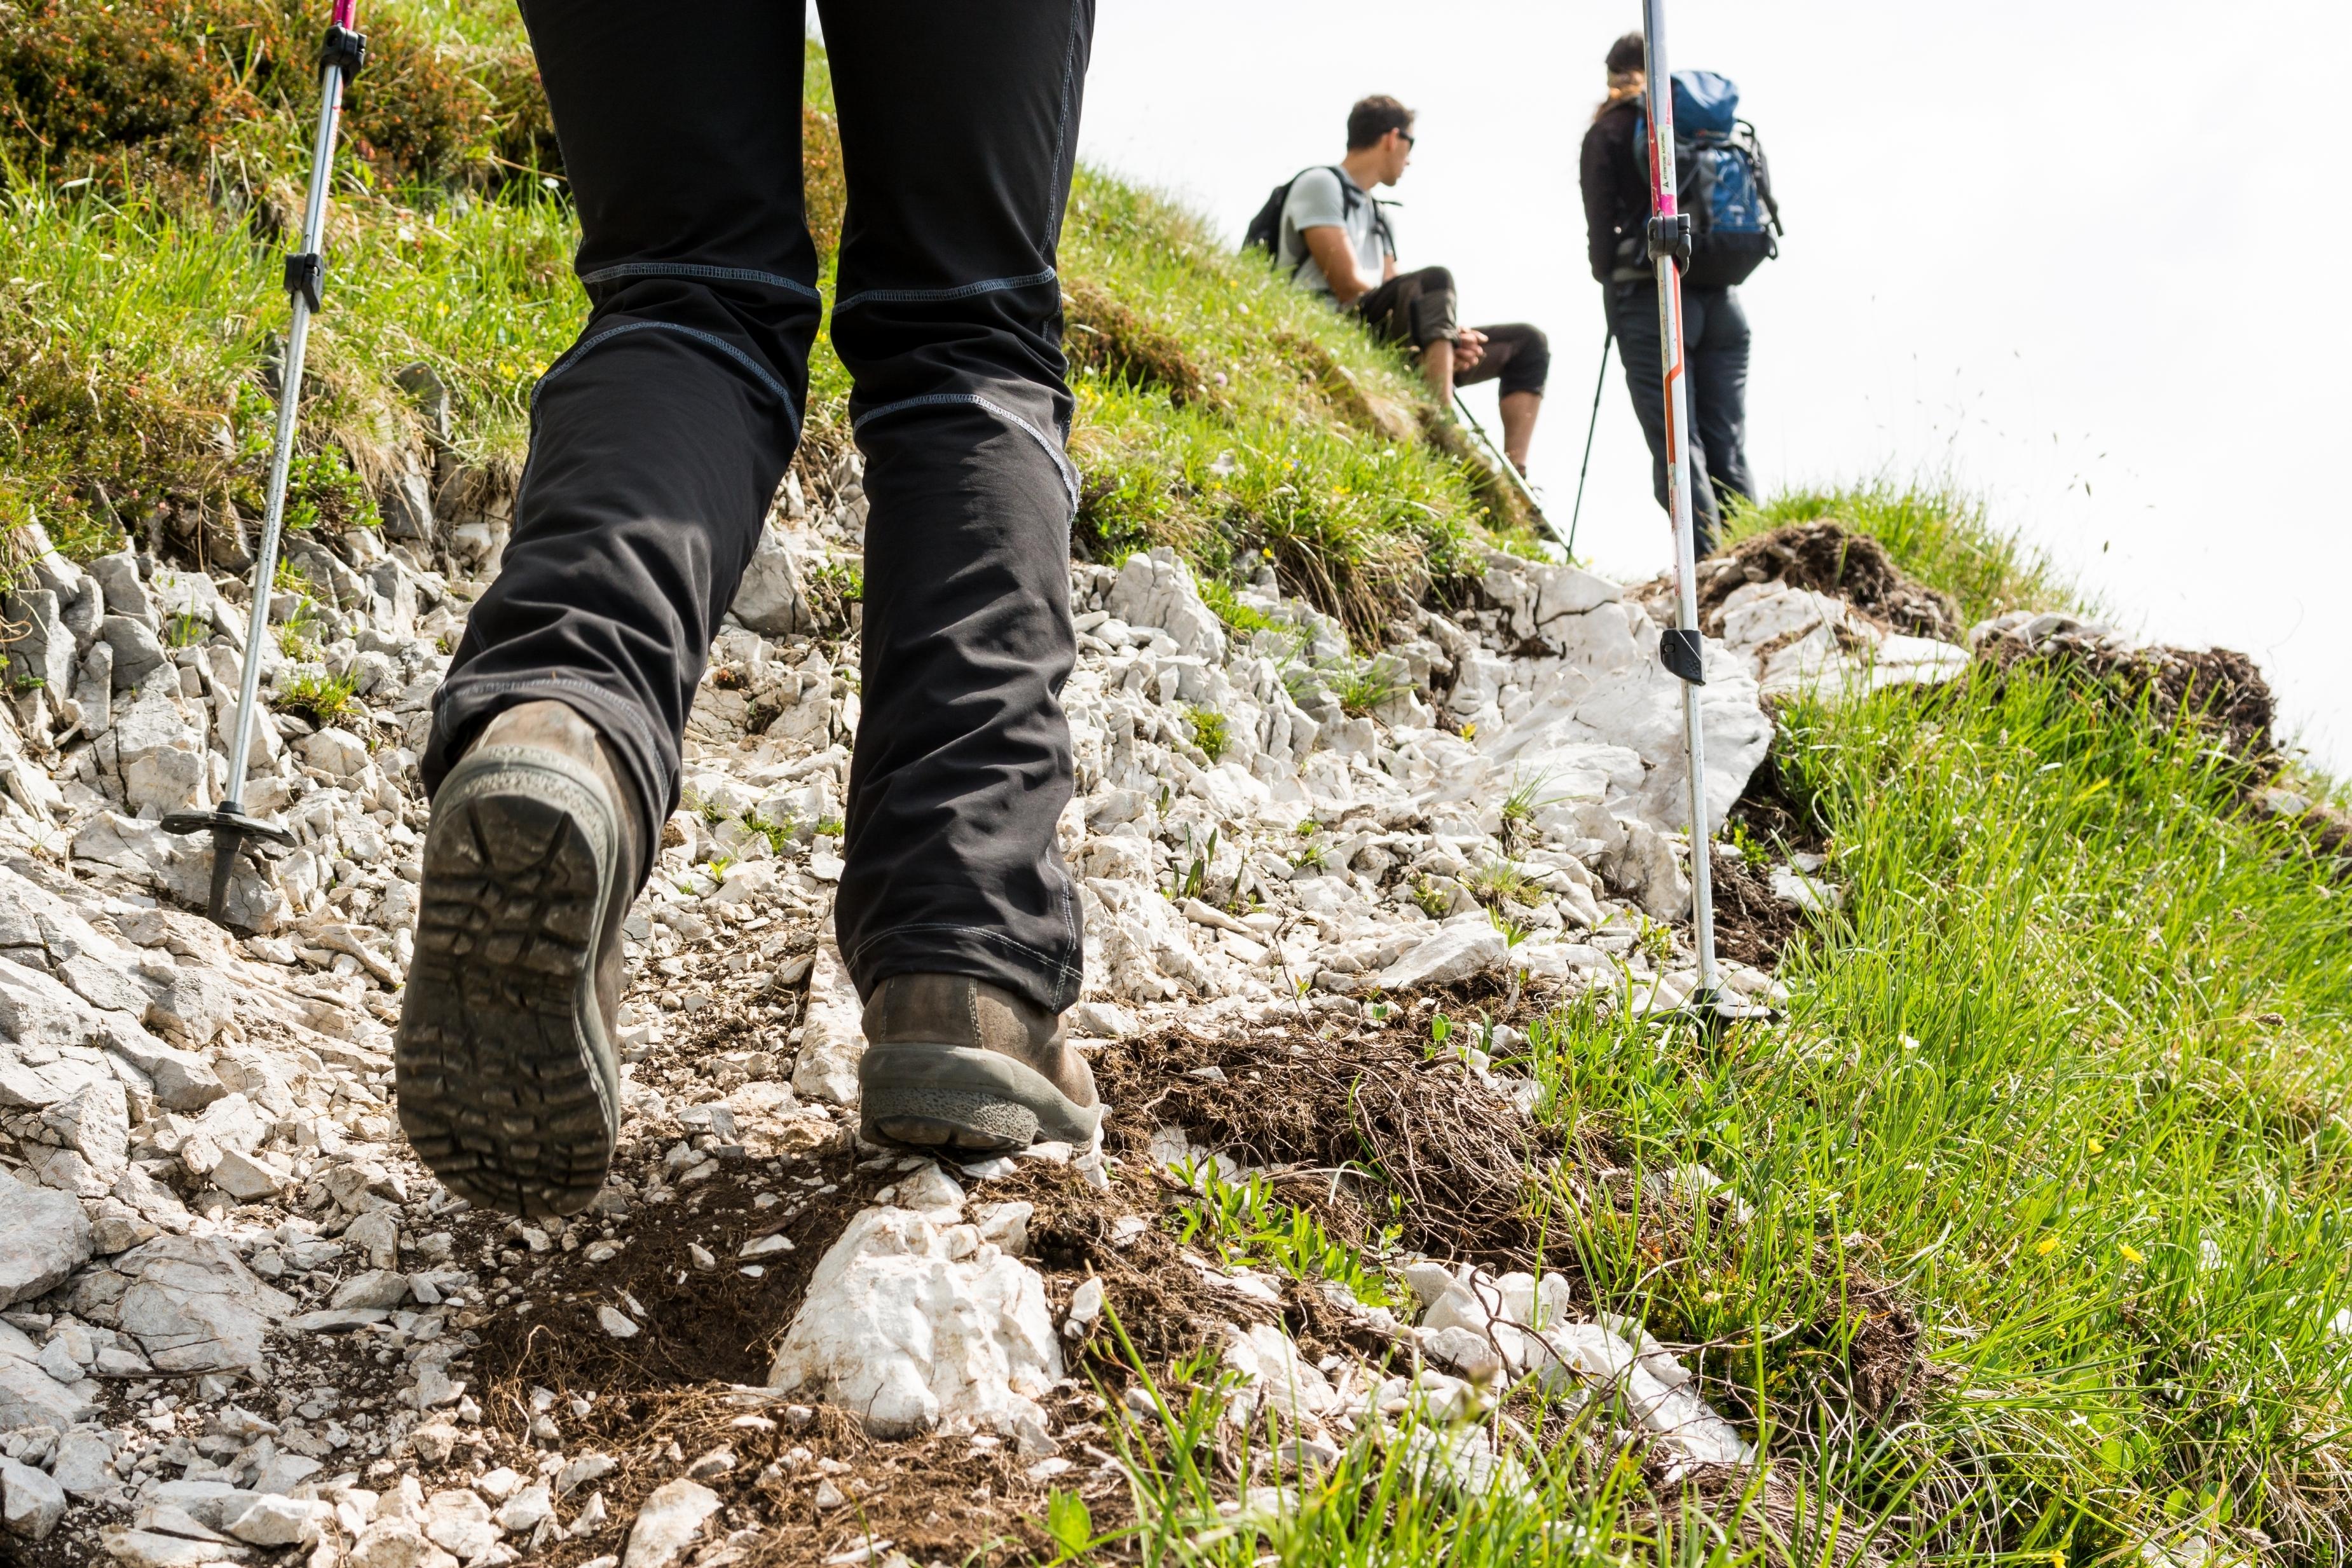 Buty Trekkingowe Jakie Wybrac Test Traveler